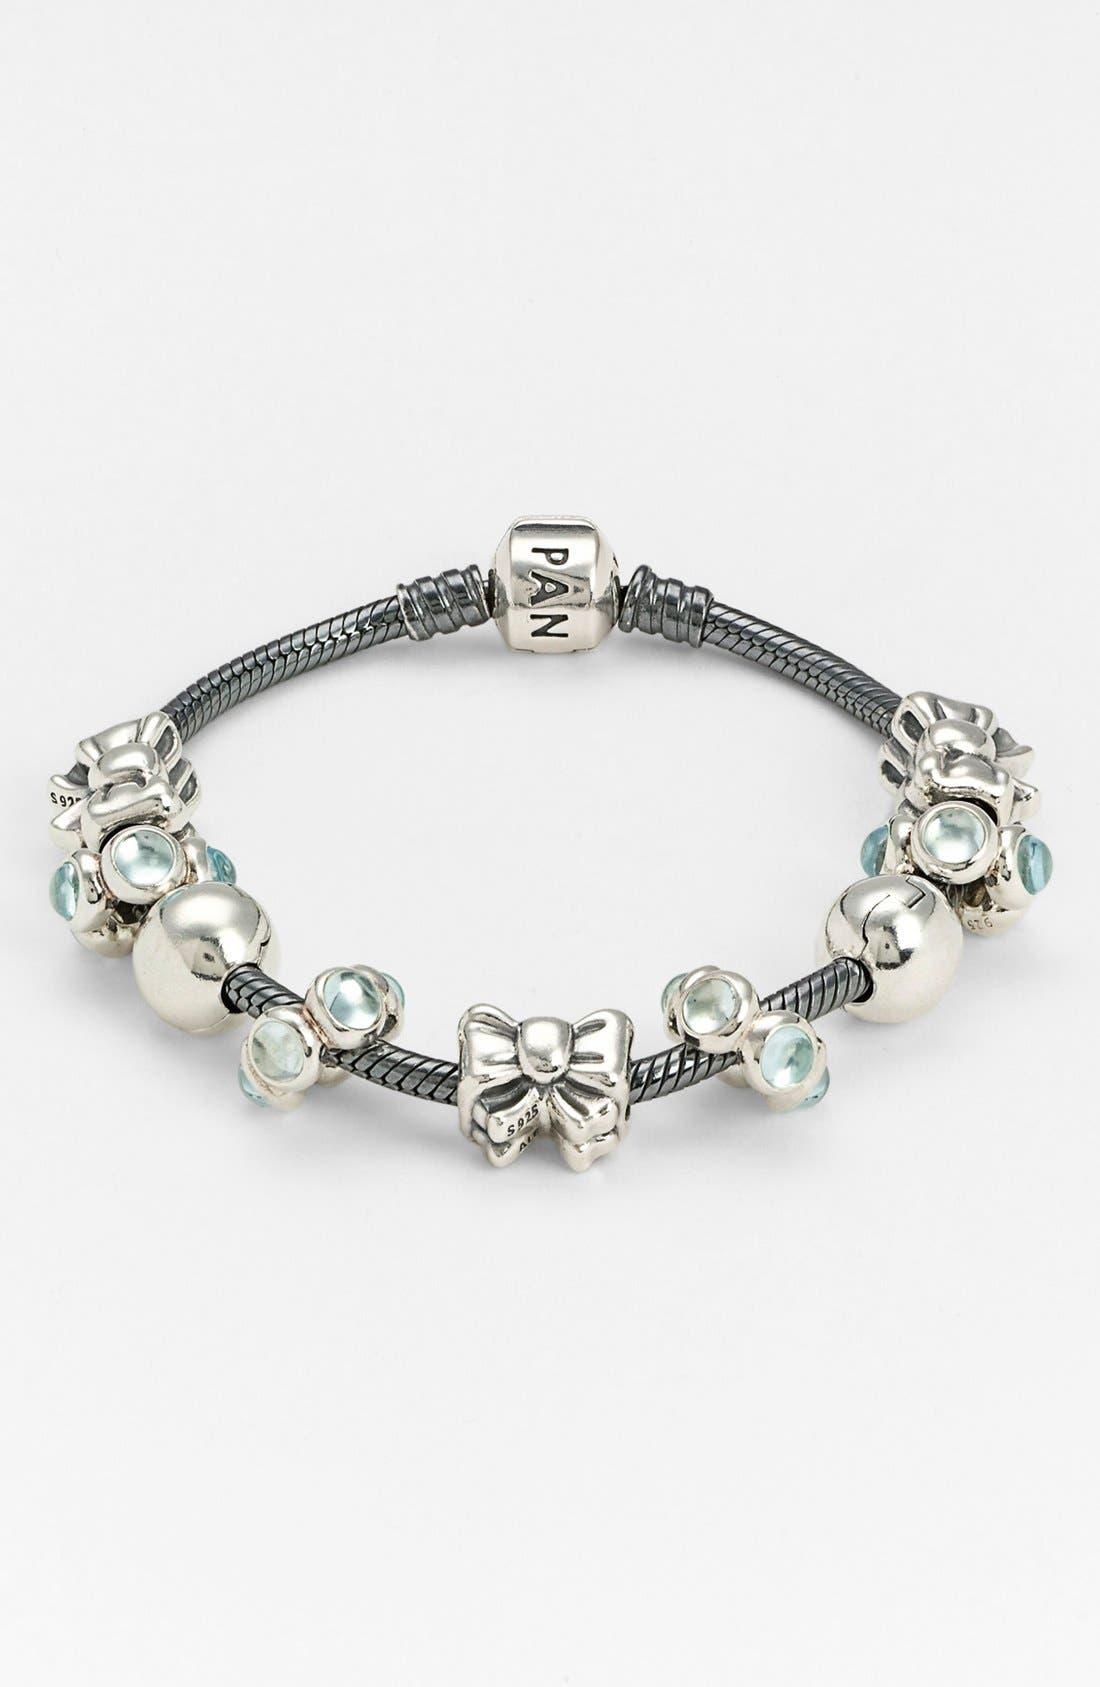 Oxidized Sterling Silver Charm Bracelet,                             Alternate thumbnail 2, color,